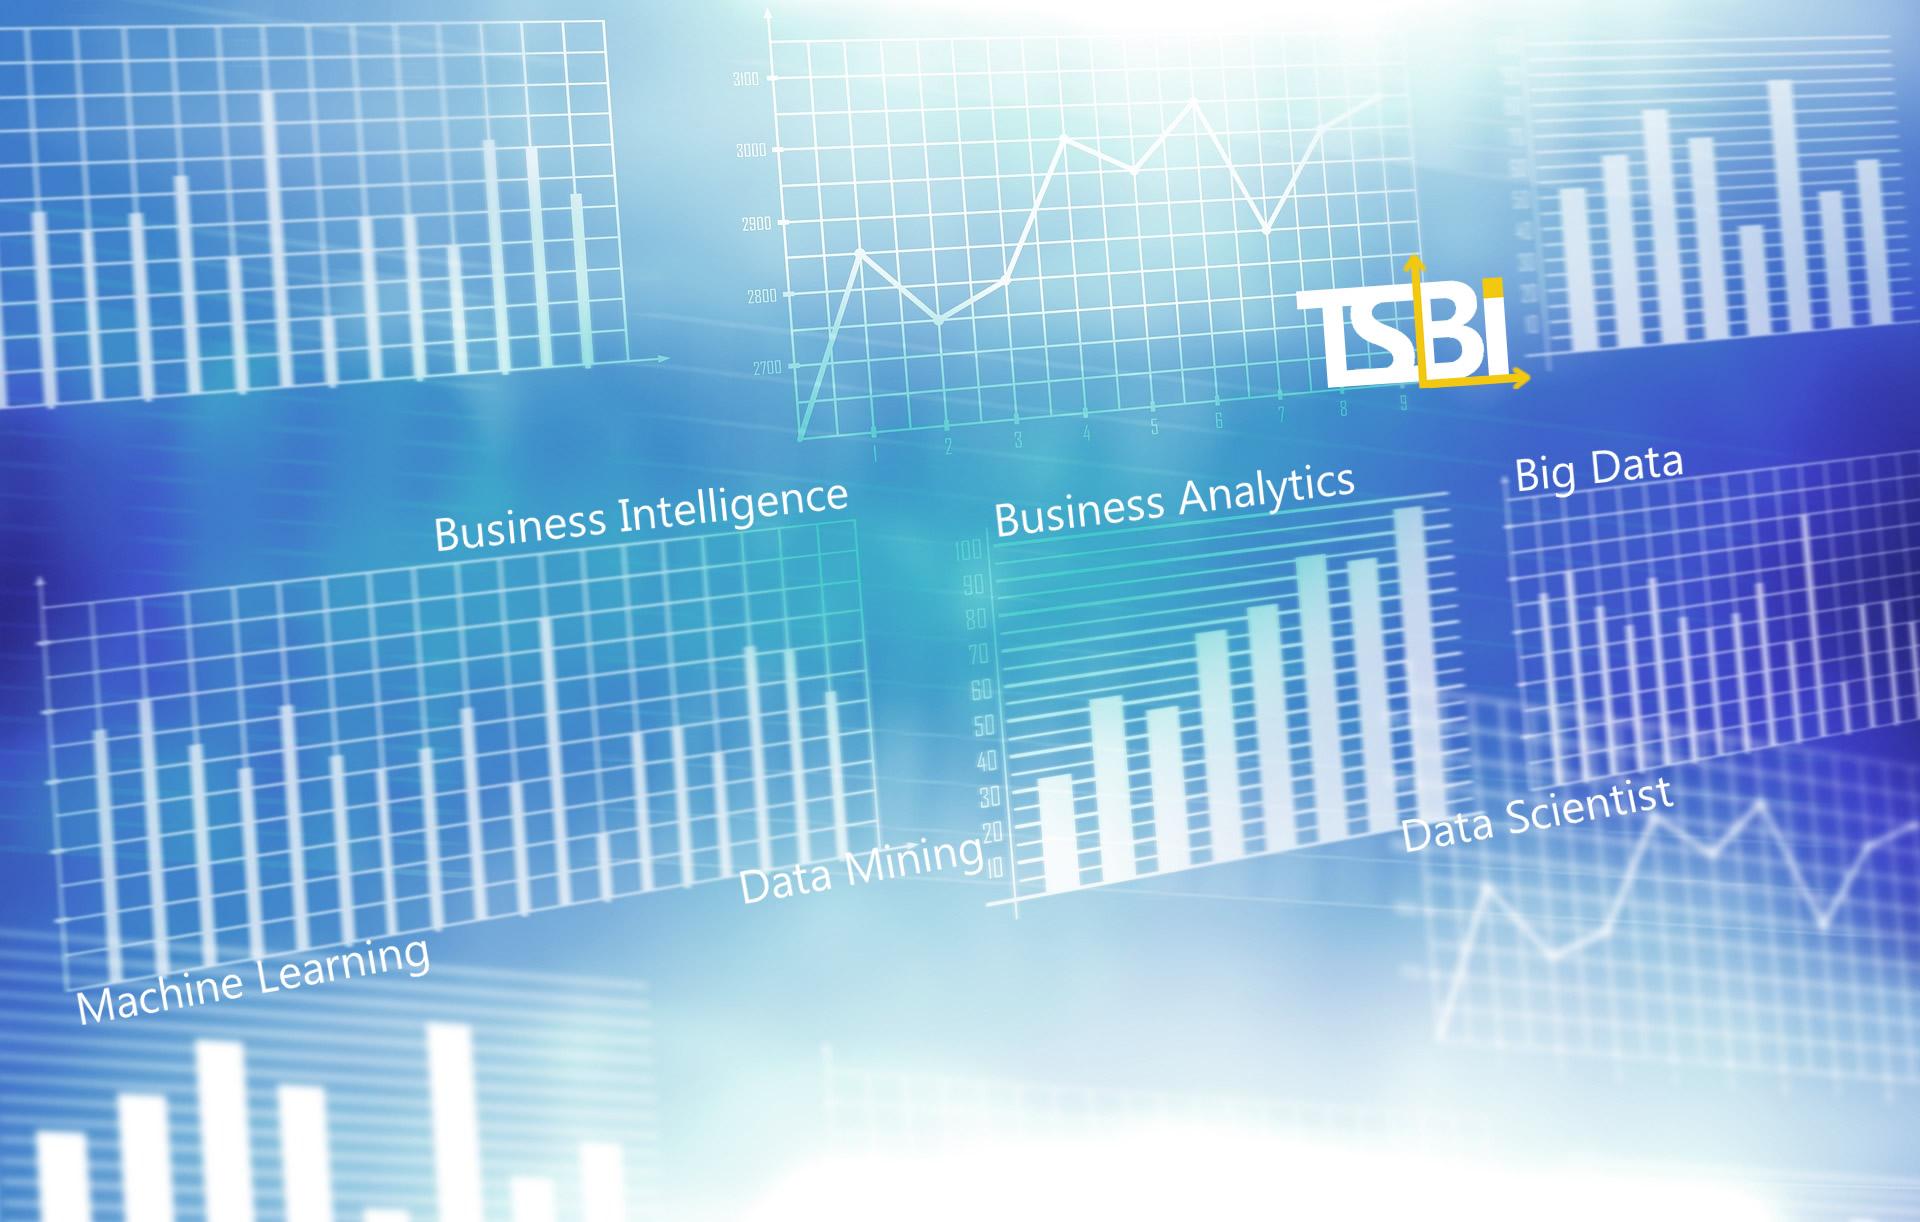 Business Intelligence vs Big Data